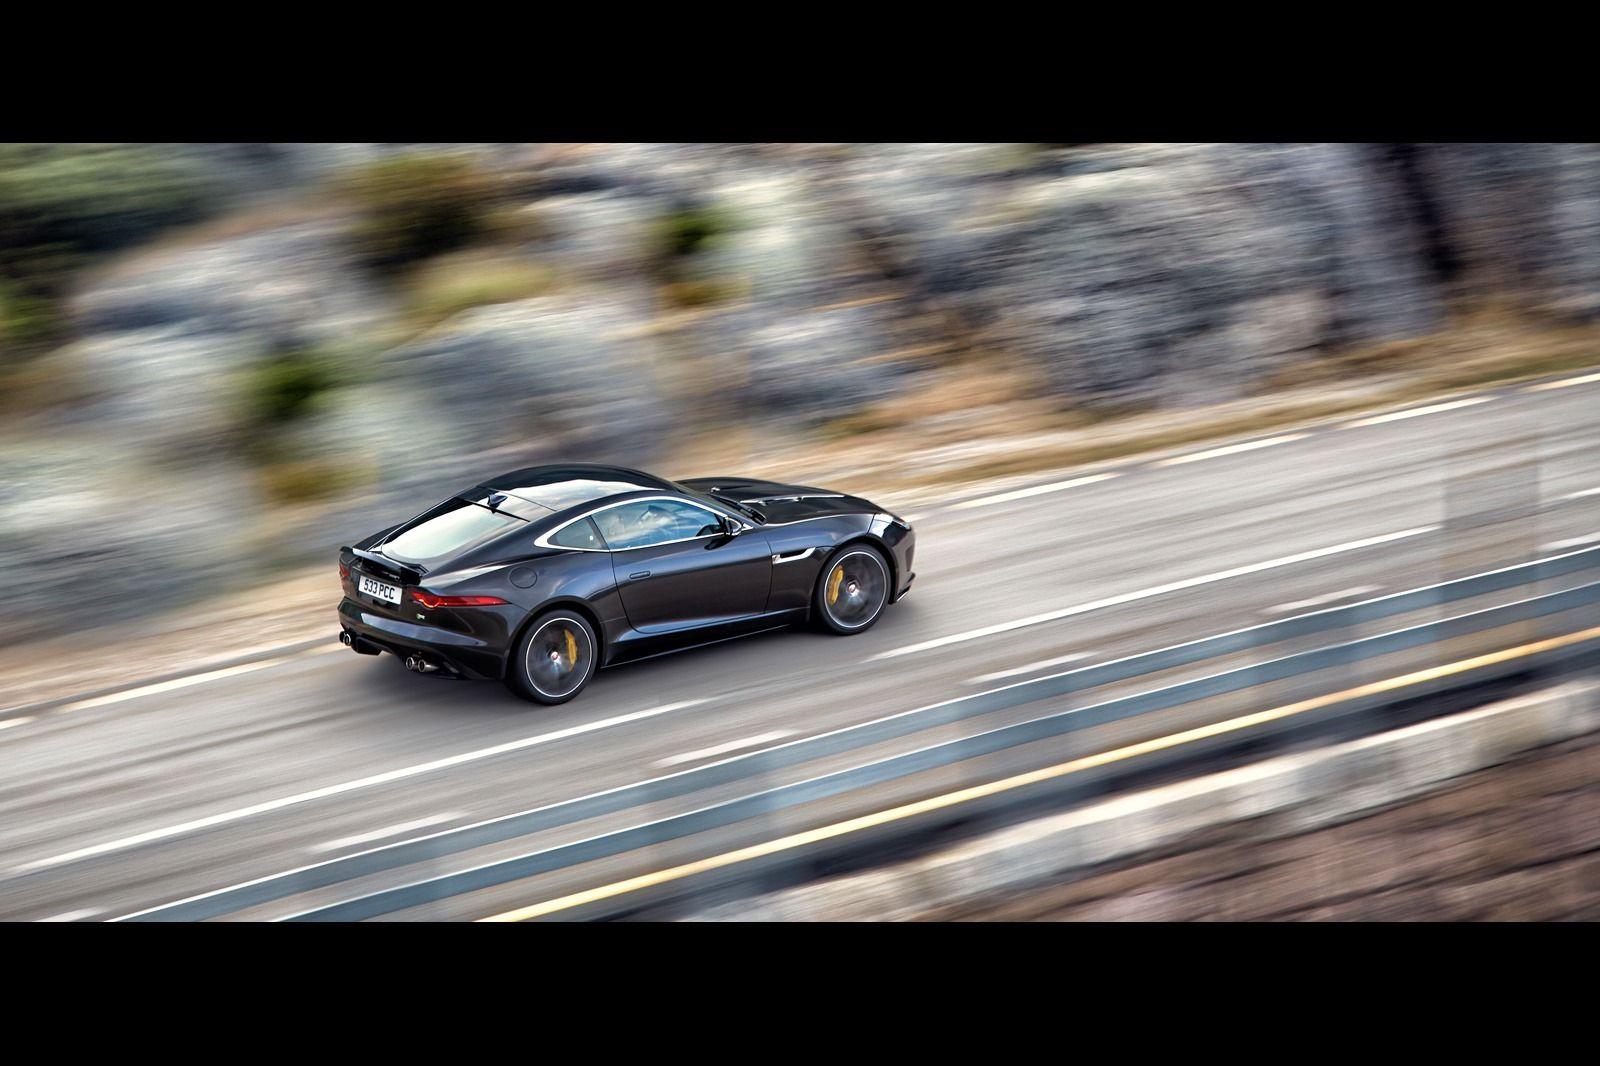 New Jaguar F-TYPE Coupé